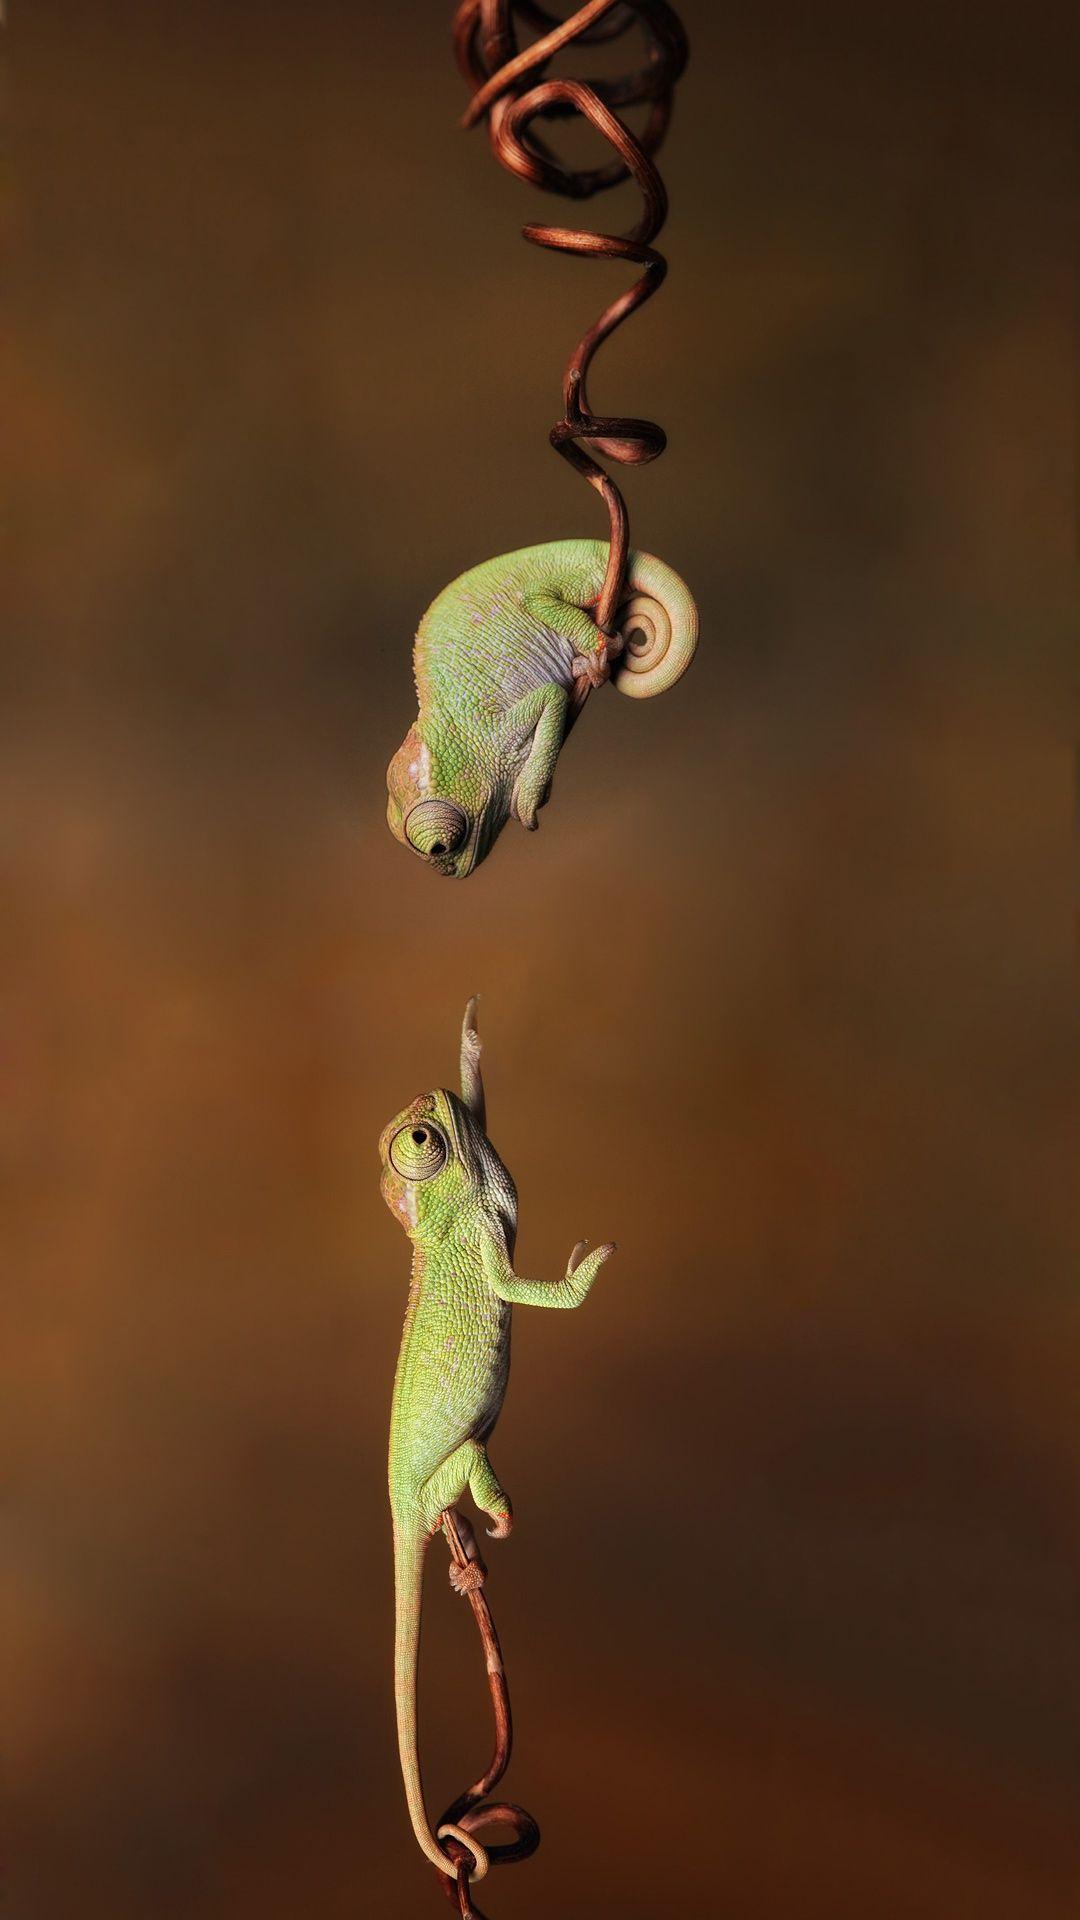 Cute Chameleon Iphone Wallpaper Iphone Wallpaper Best